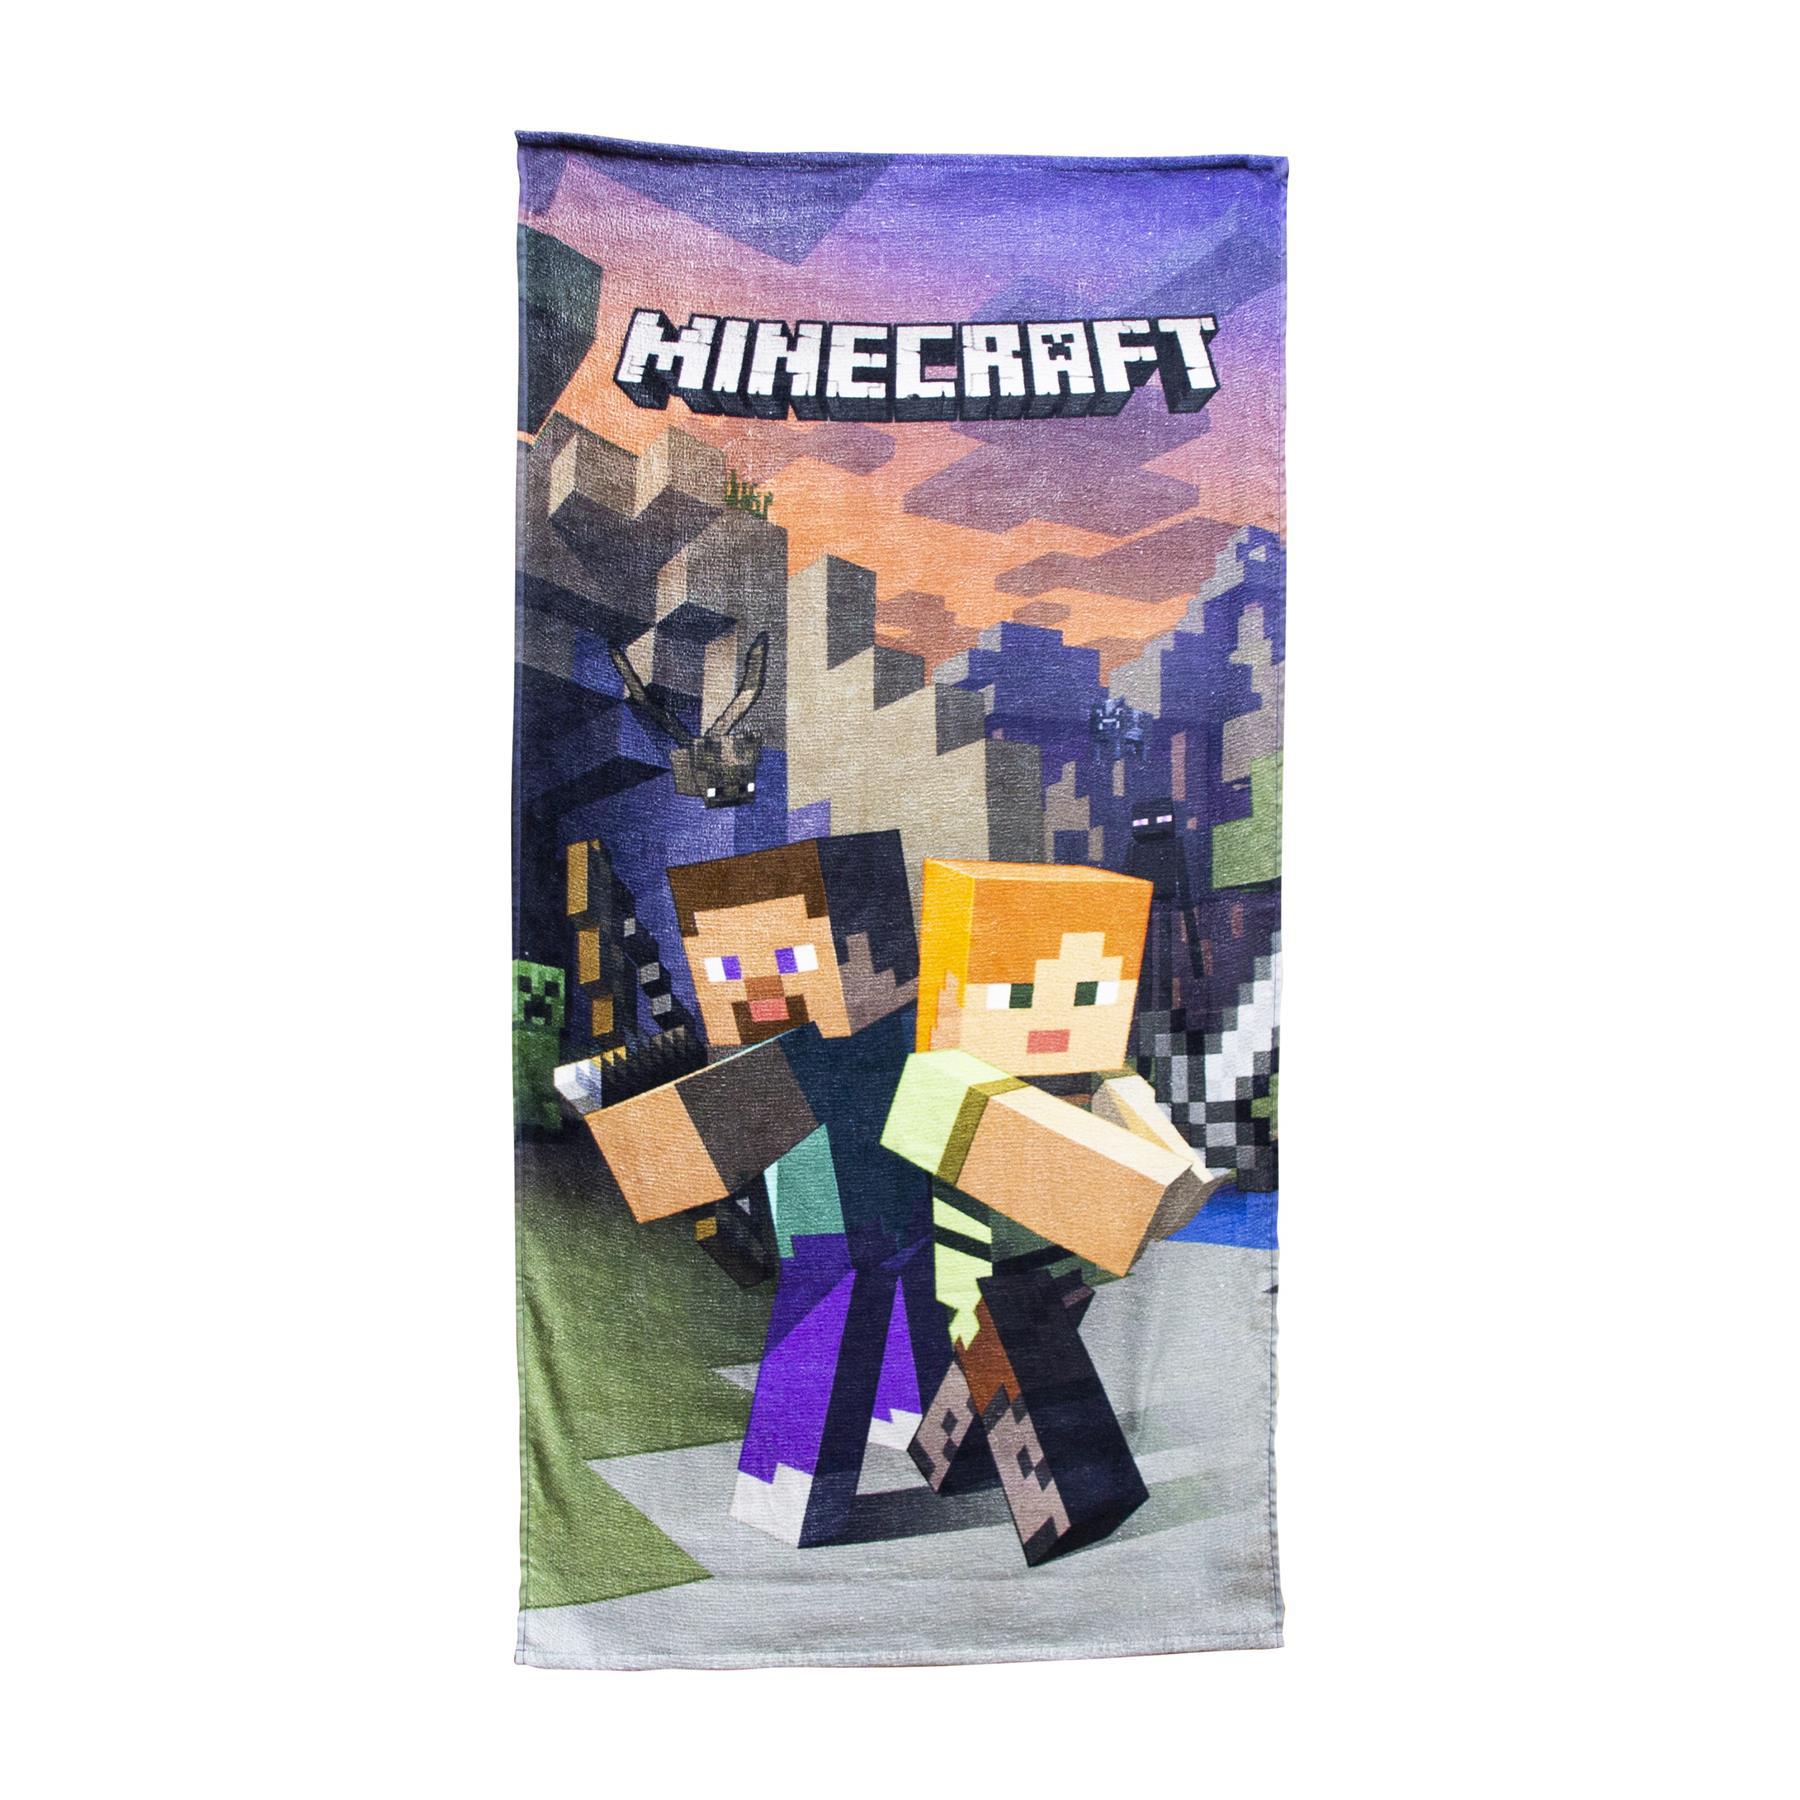 miniatura 53 - Minecraft Biancheria da letto Creeper PIUMONI Asciugamano Cuscino Coperta-venduta separatamente